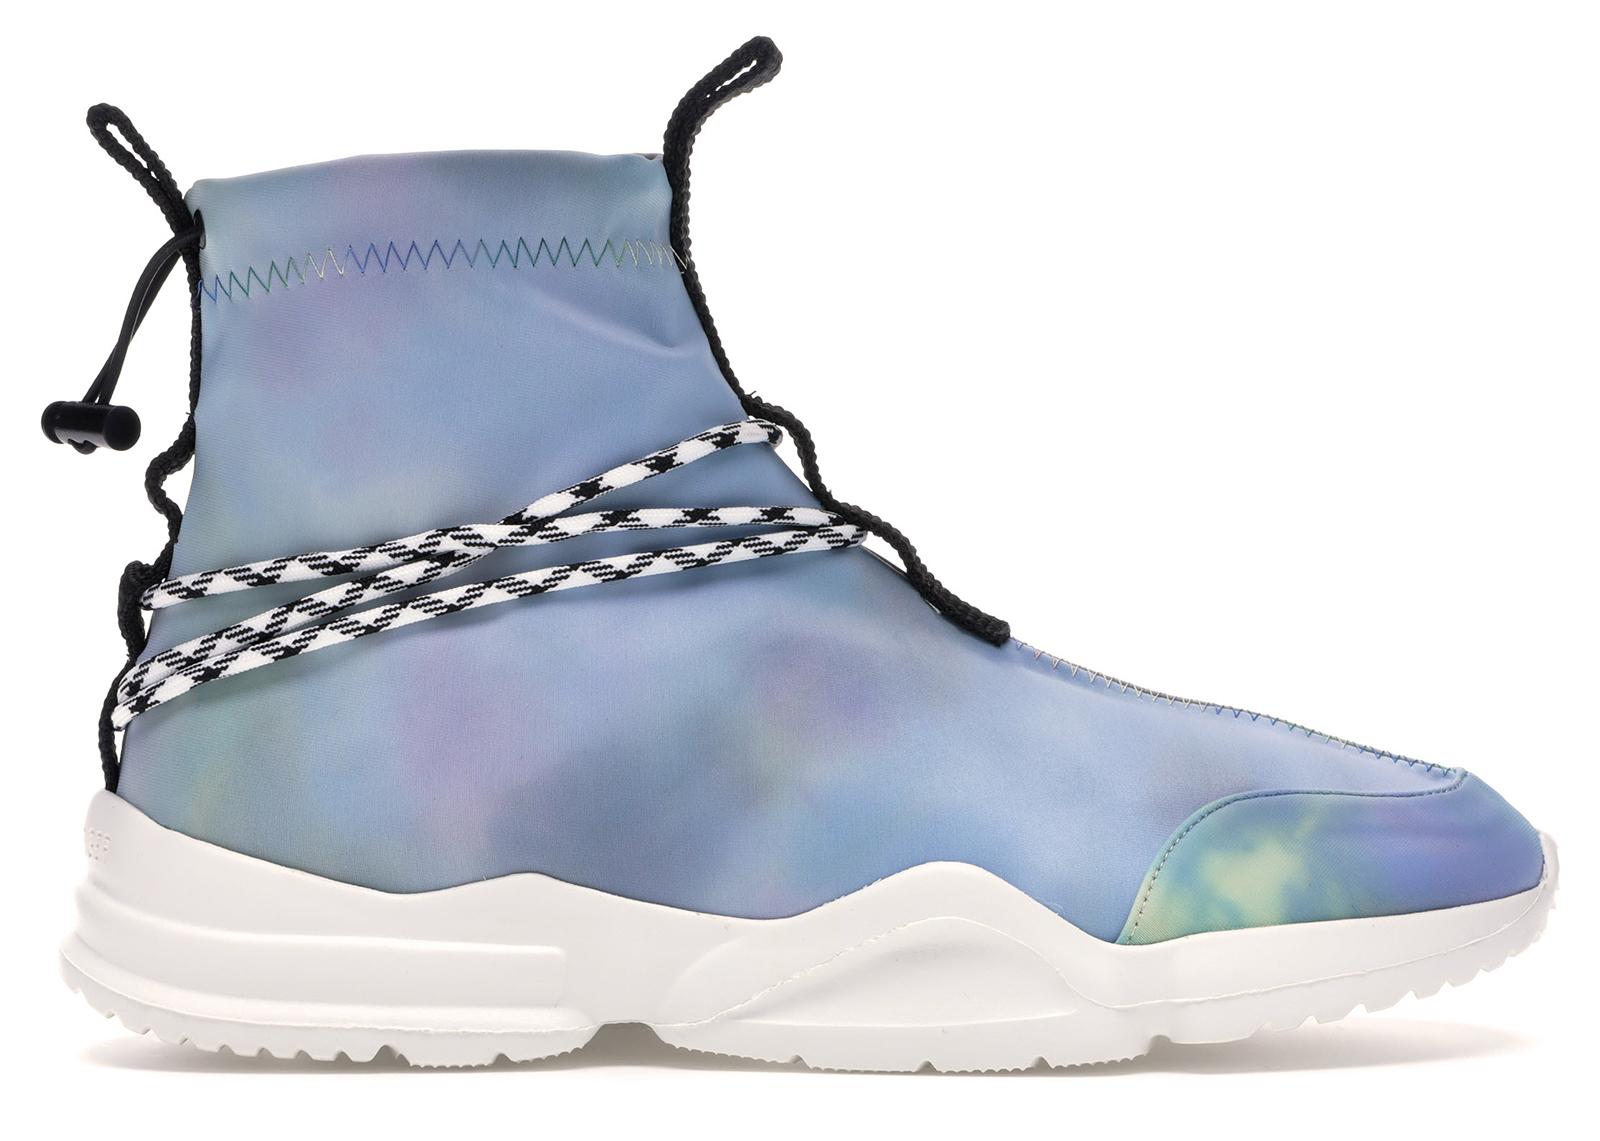 John Geiger 002 Chella - Sneakers